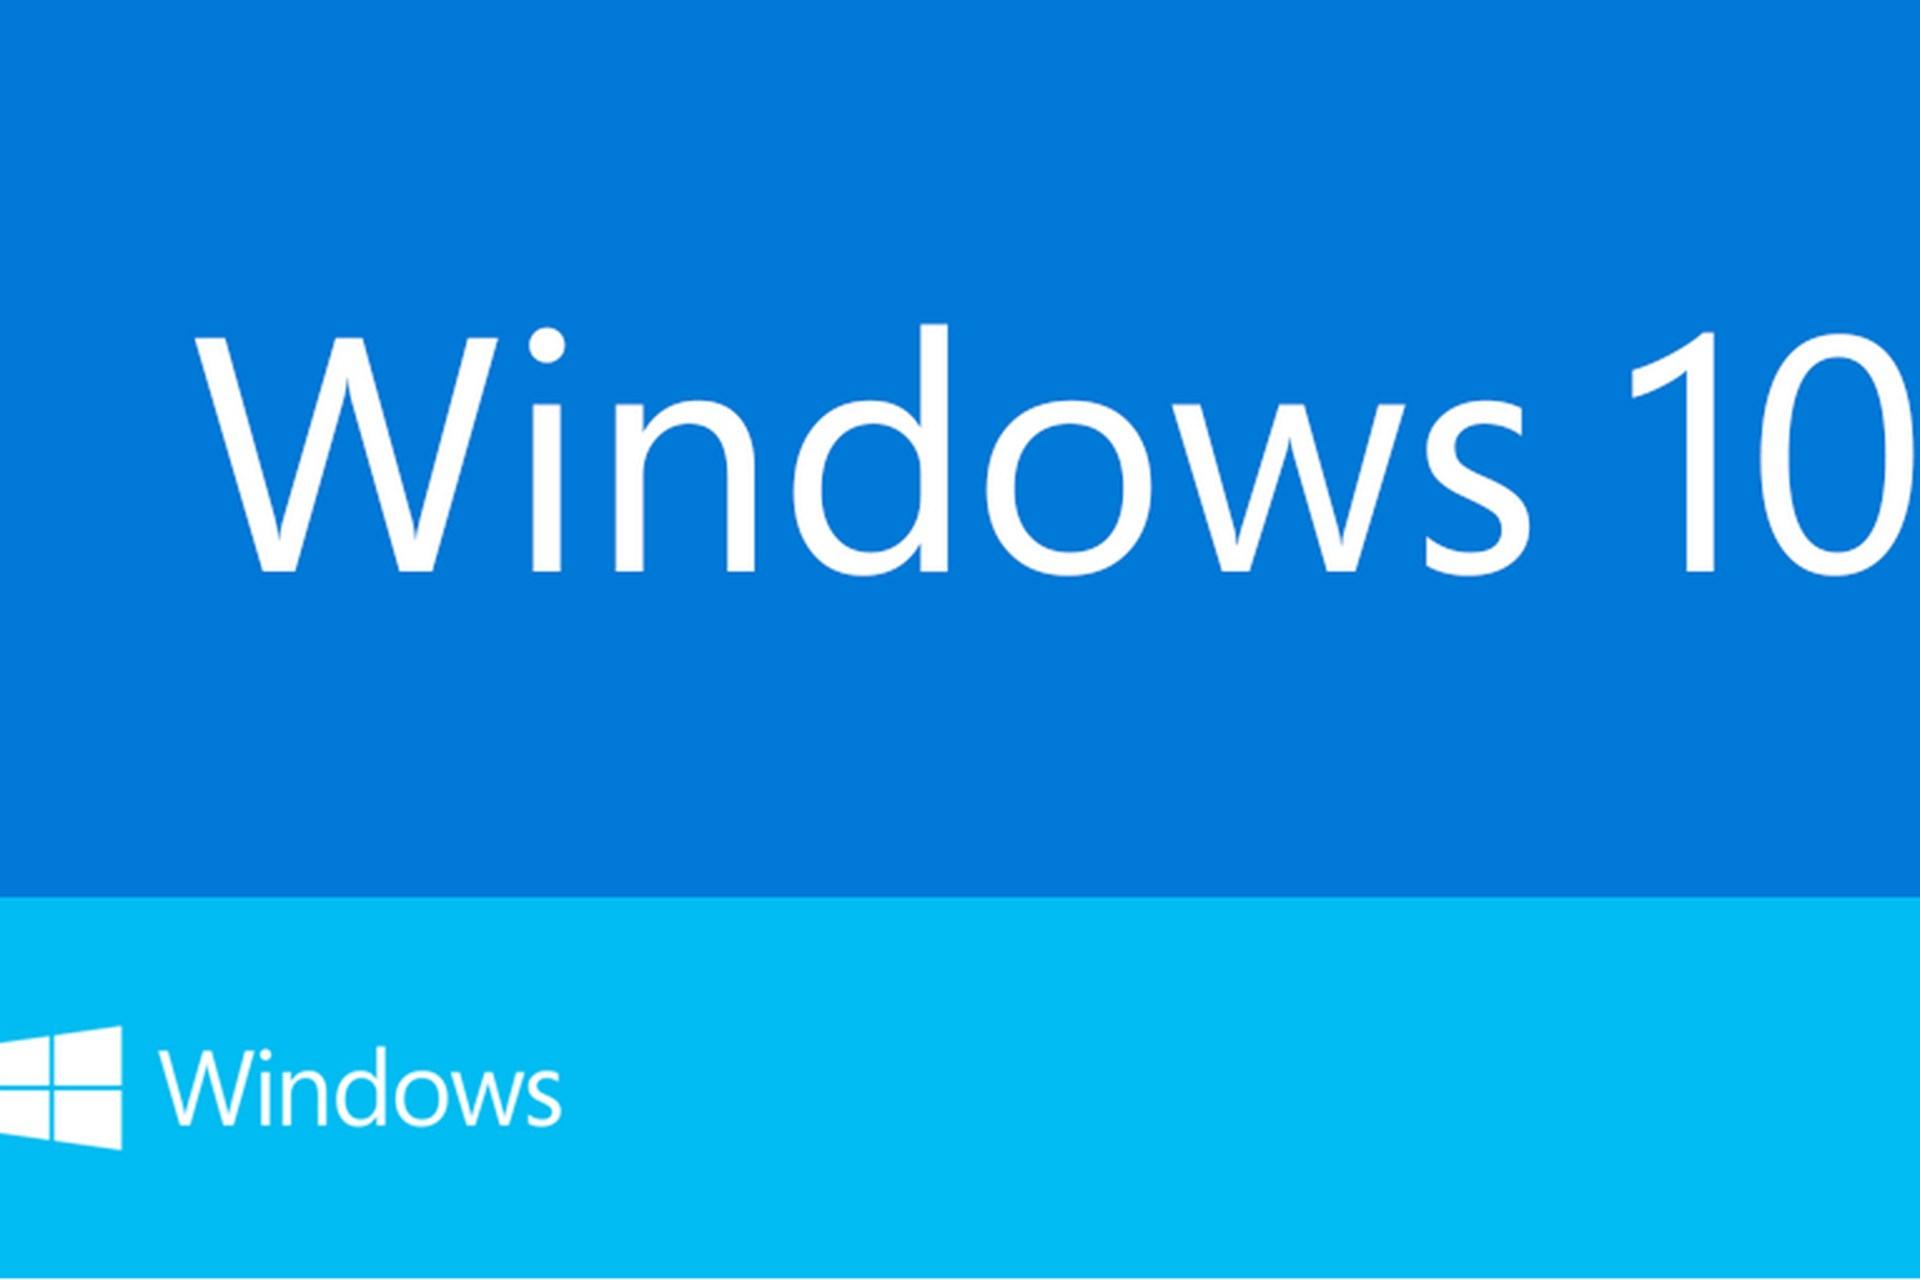 Windows 10 Wallpaper Pack: Windows 10 Wallpaper Pack